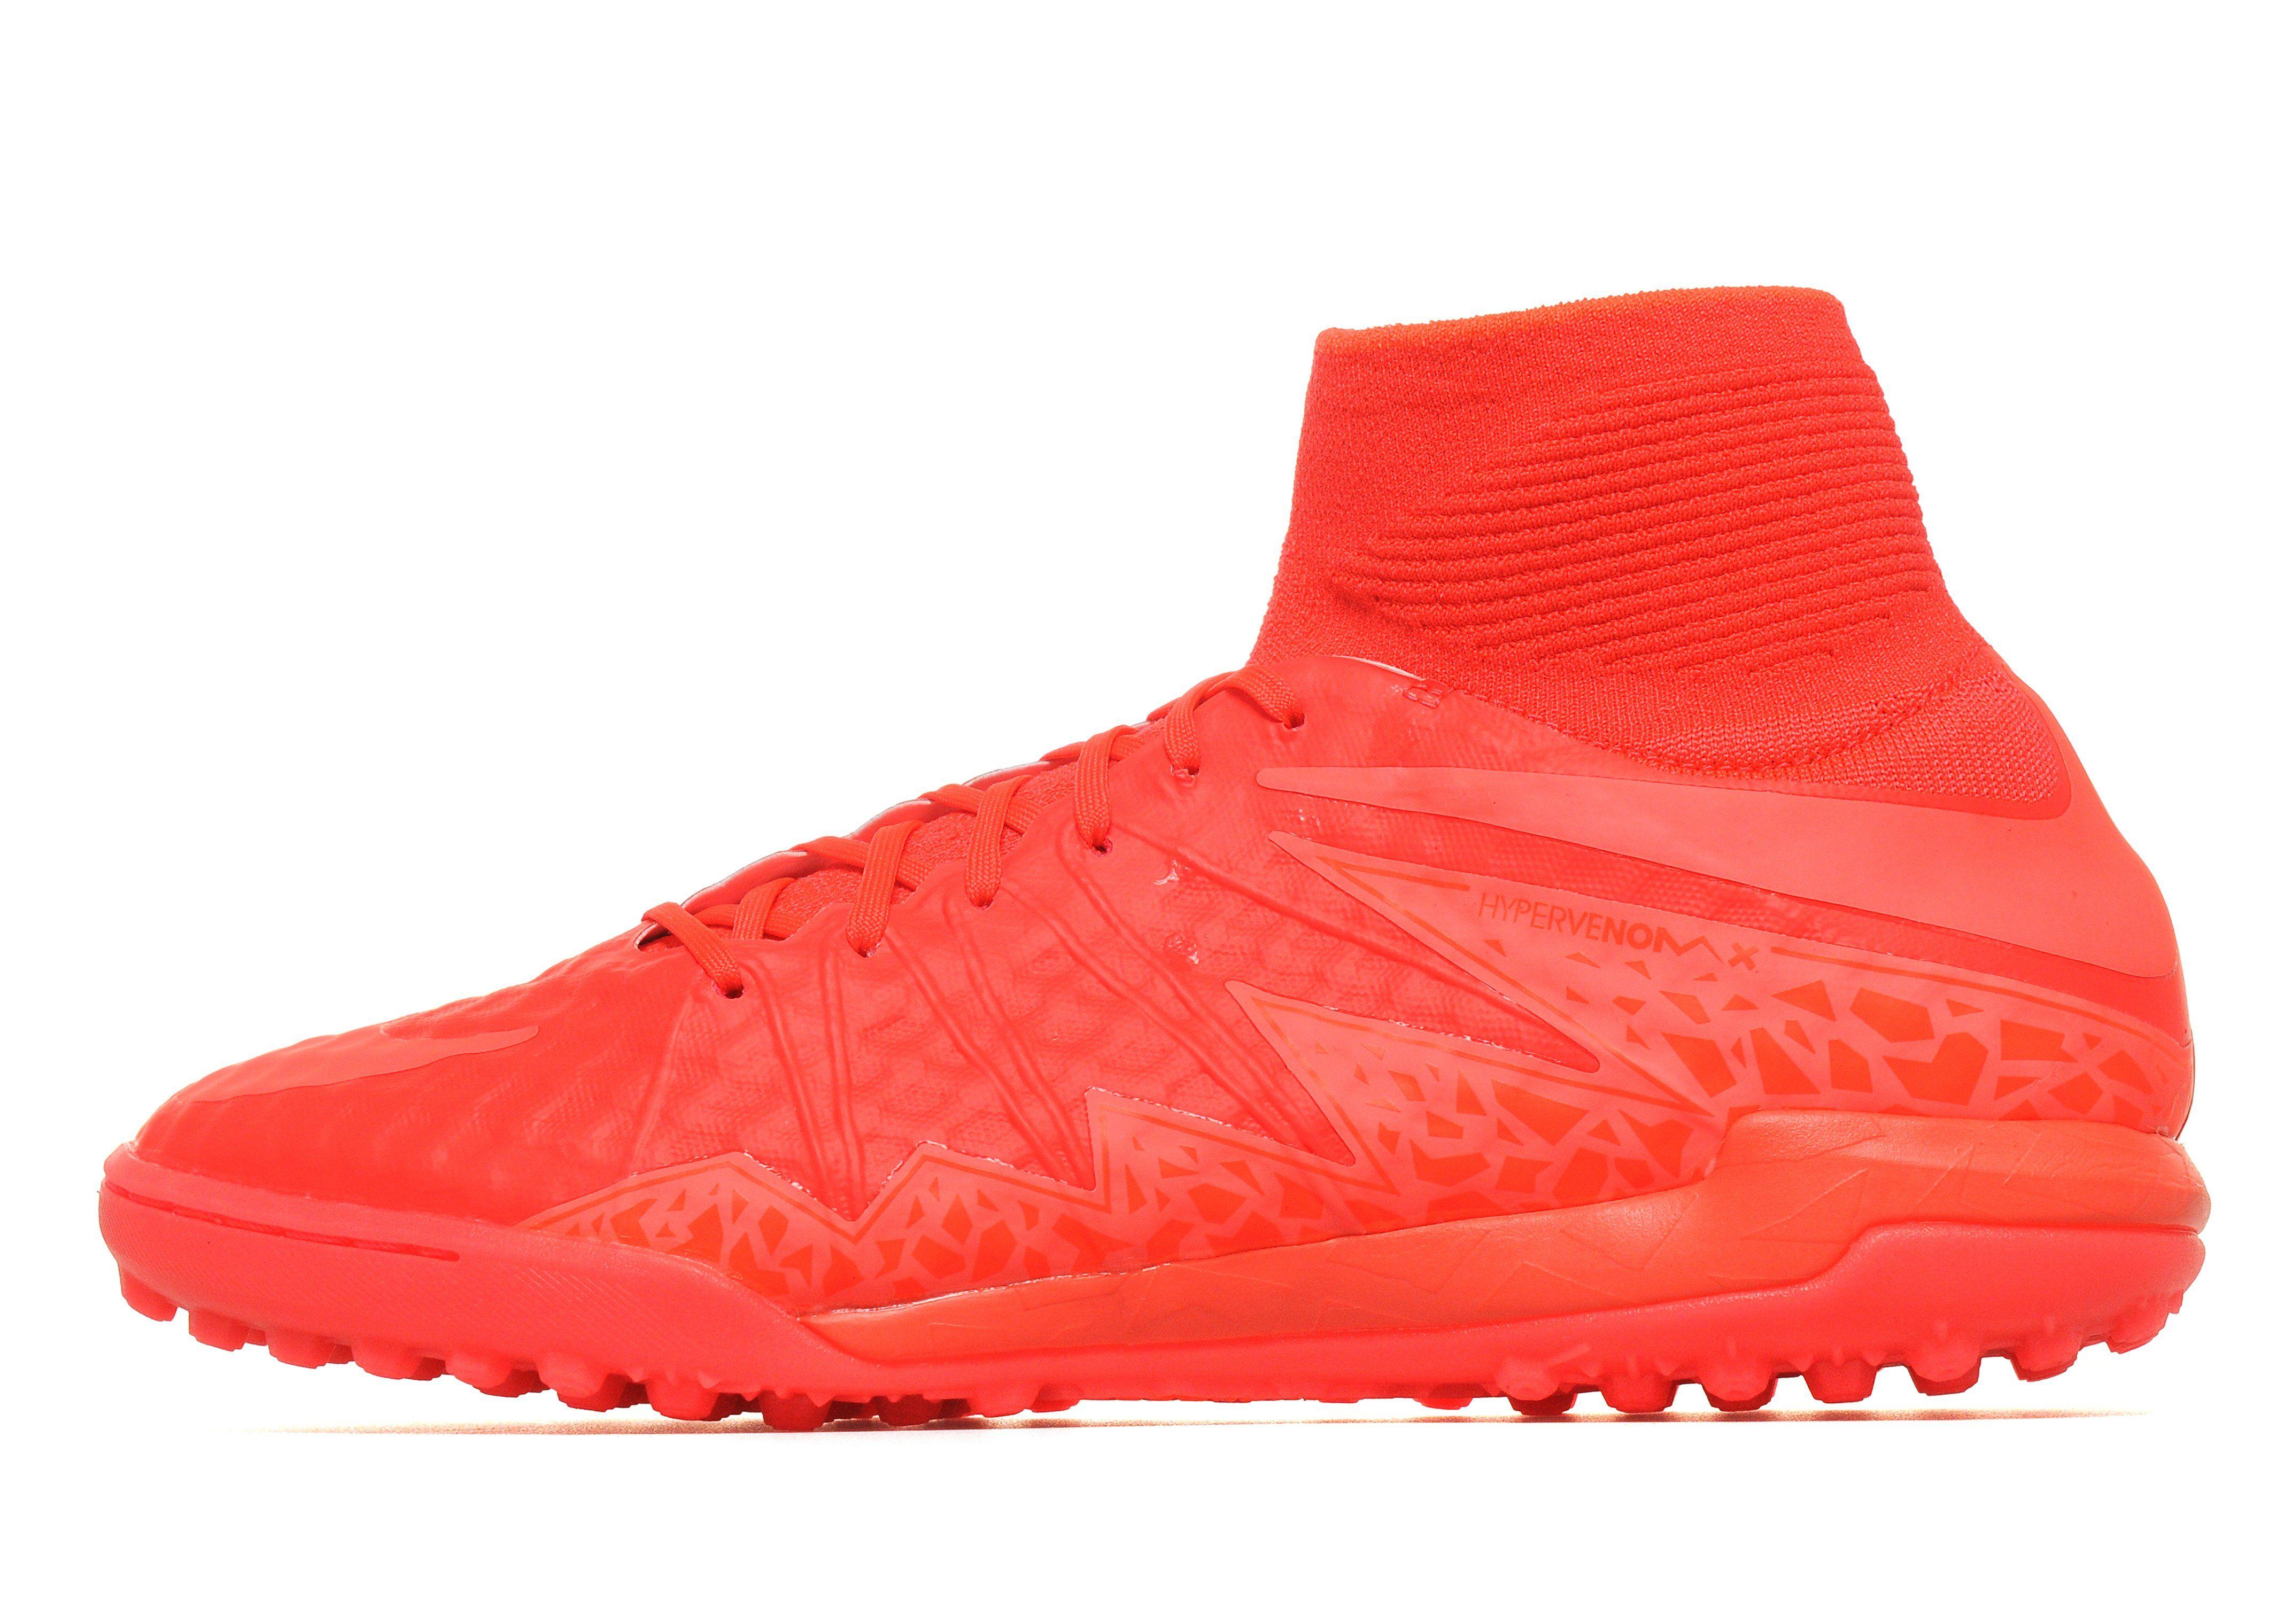 9d448f7c9fb1 Nike Football X Glow HypervenomX Proximo Turf